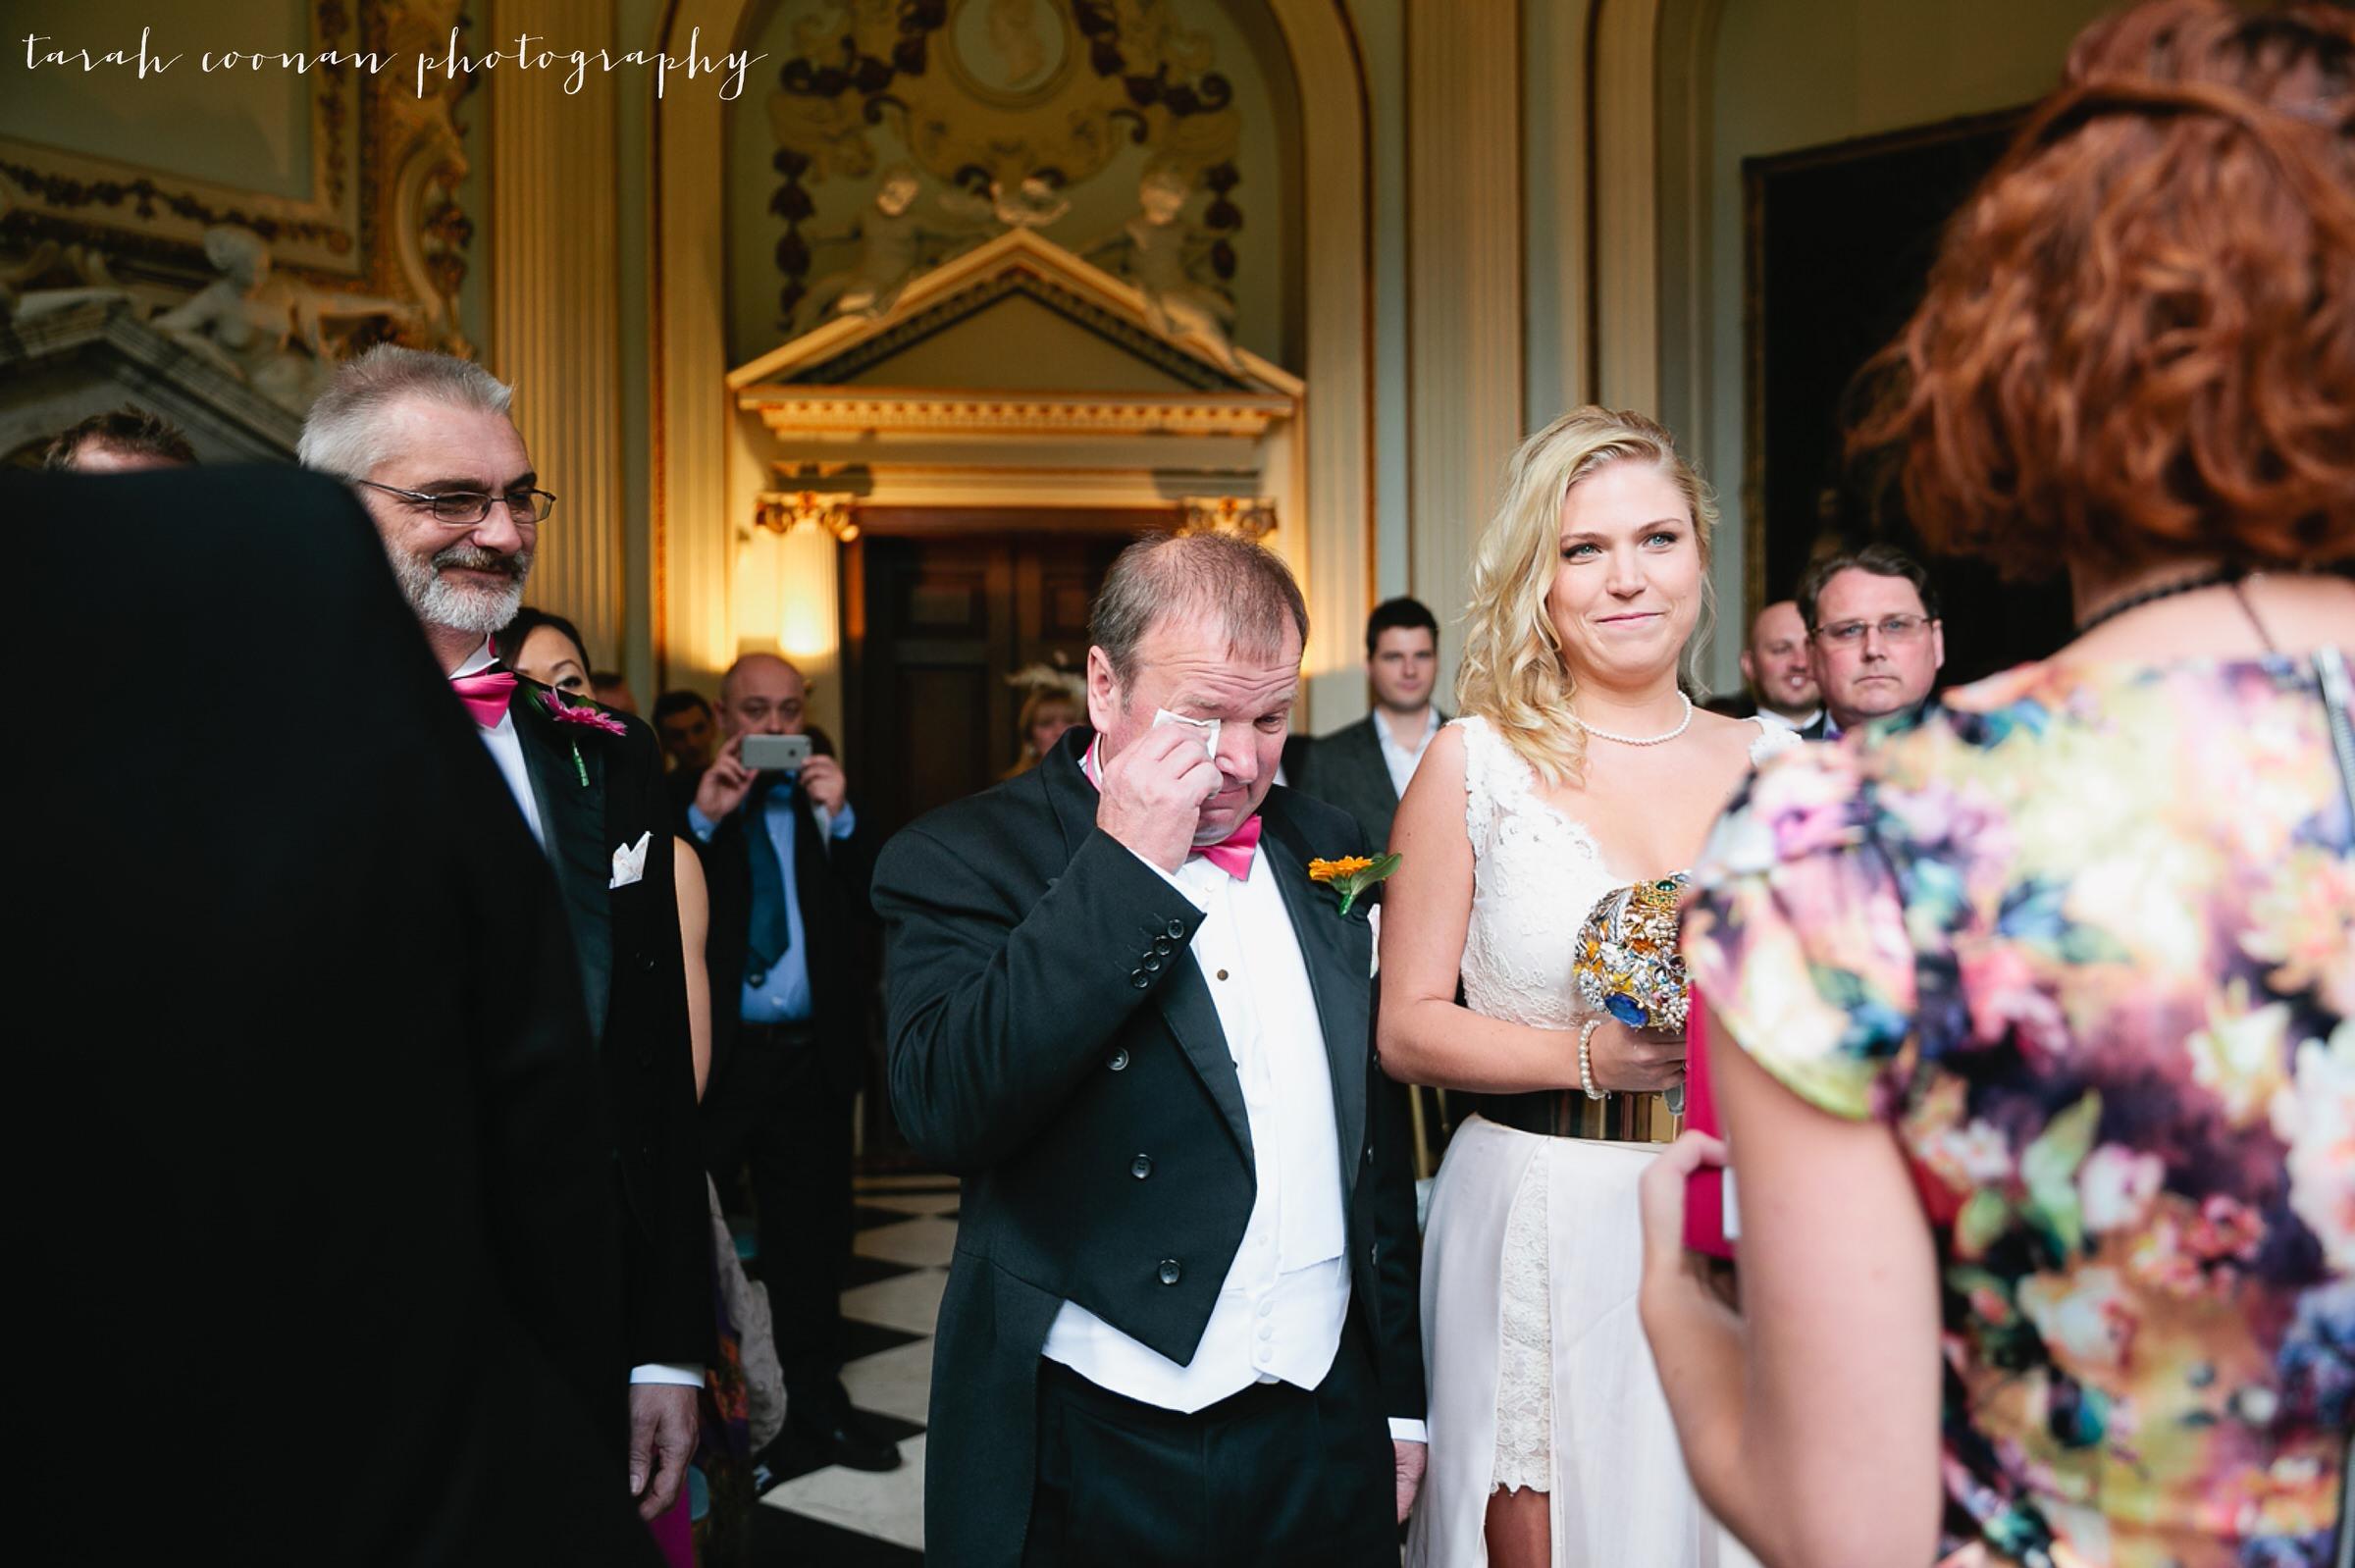 brighton-wedding-photographer12